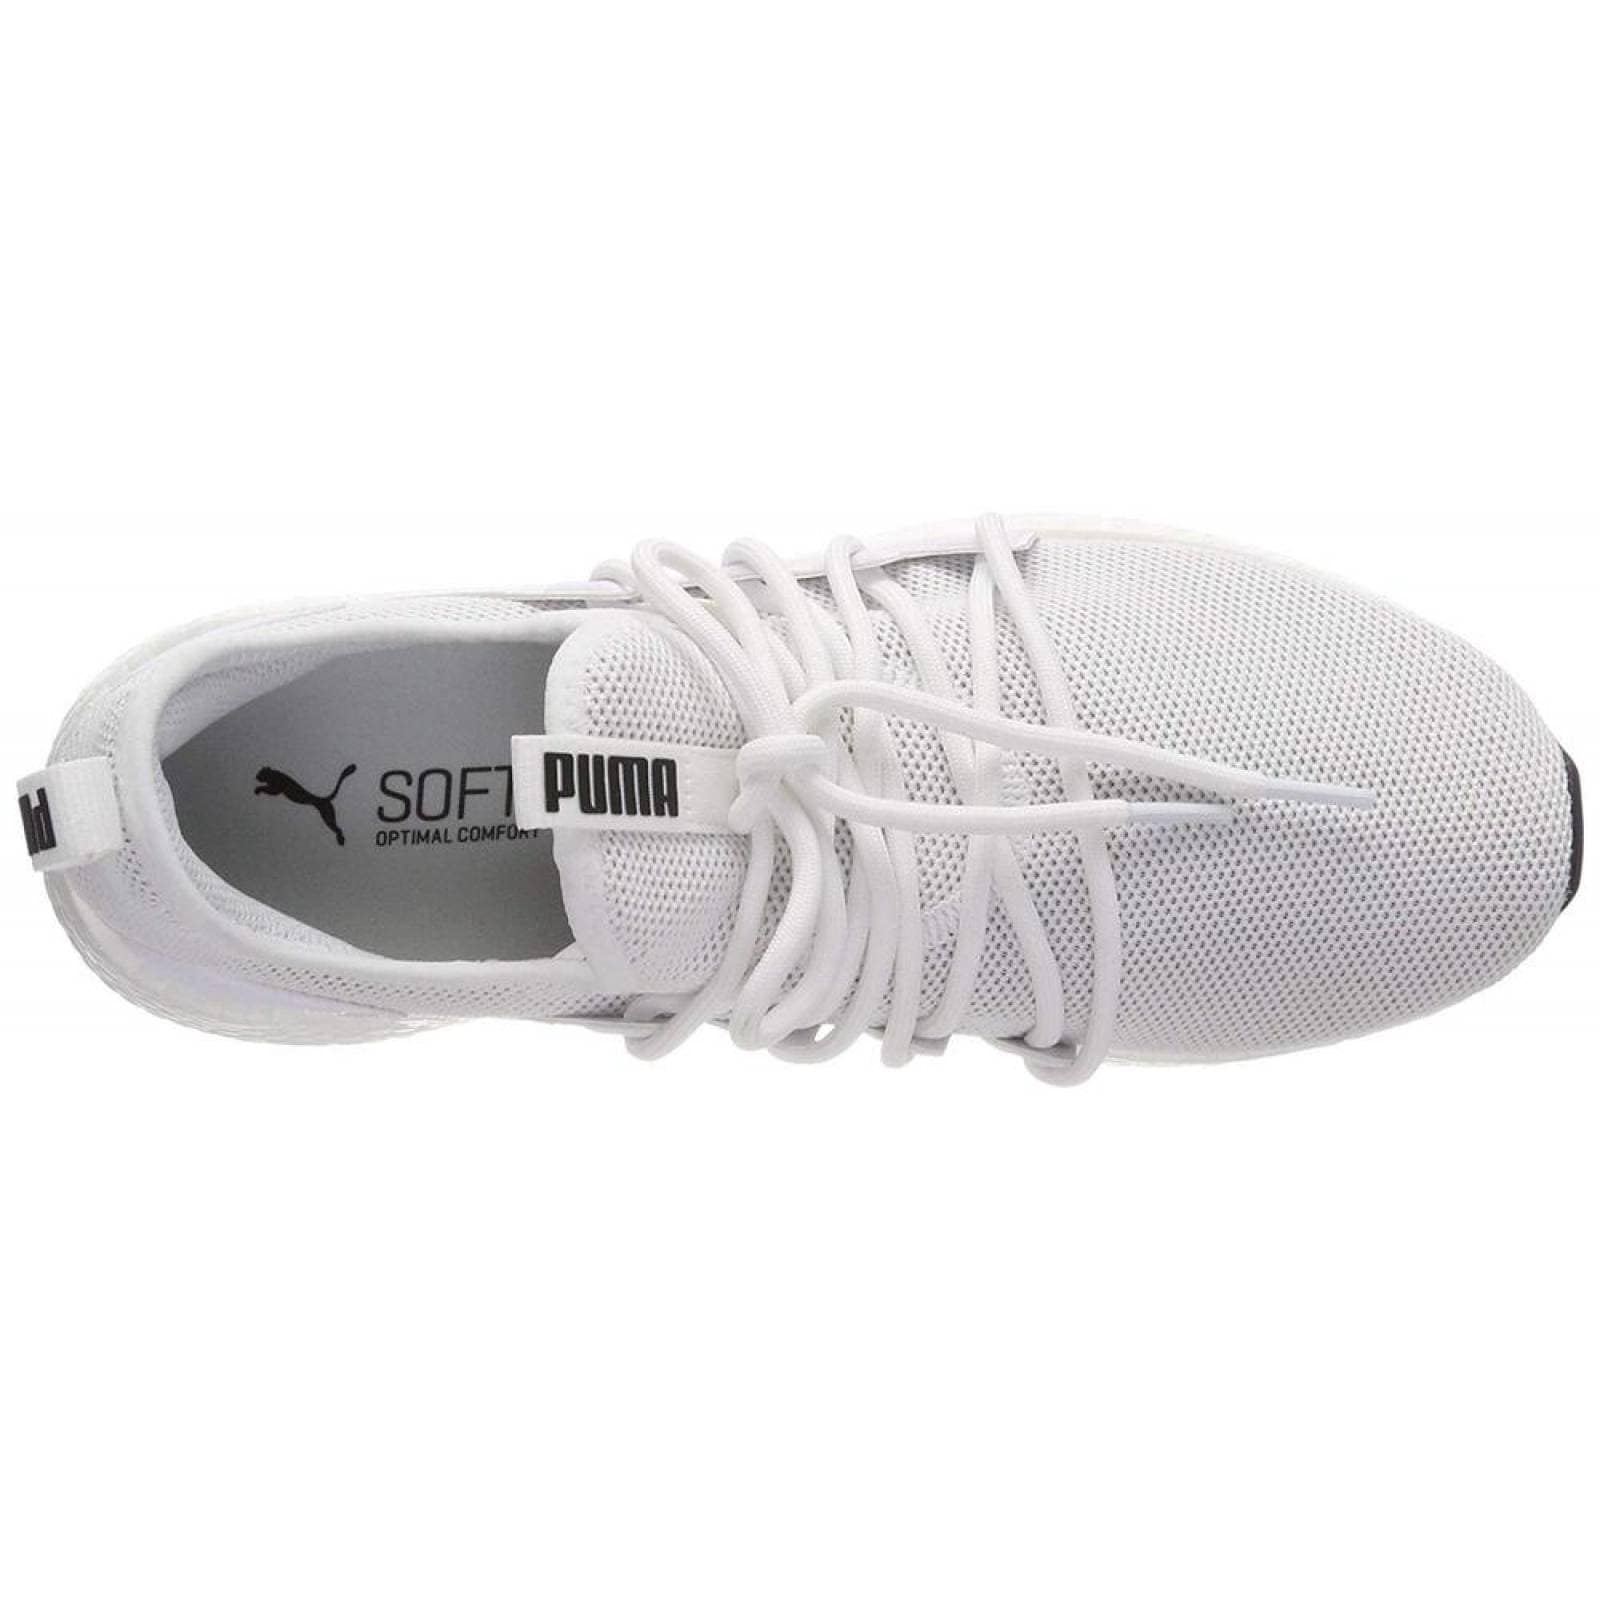 Tenis Puma NRGY ENKO 19106806 Blanco Hombre